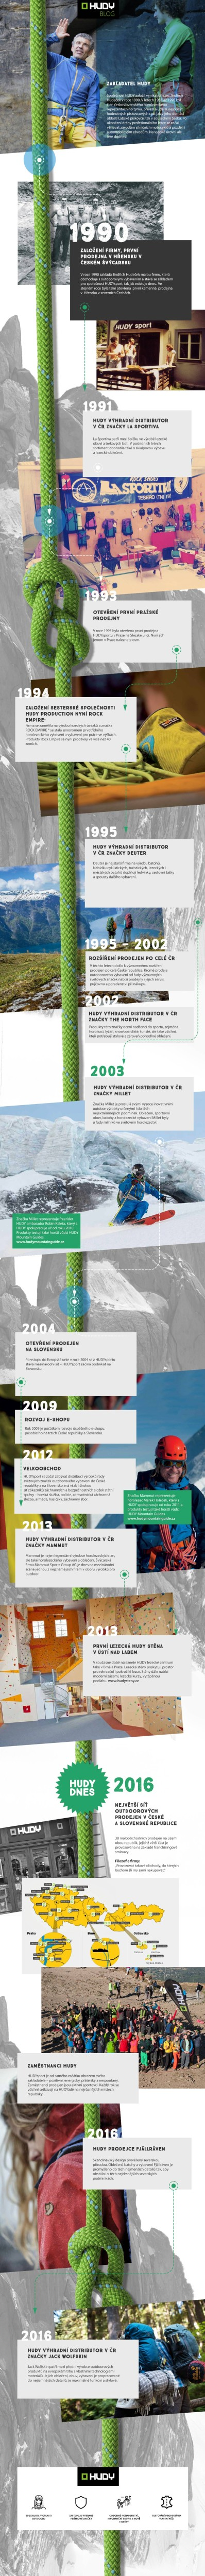 infografika-historie-hudy